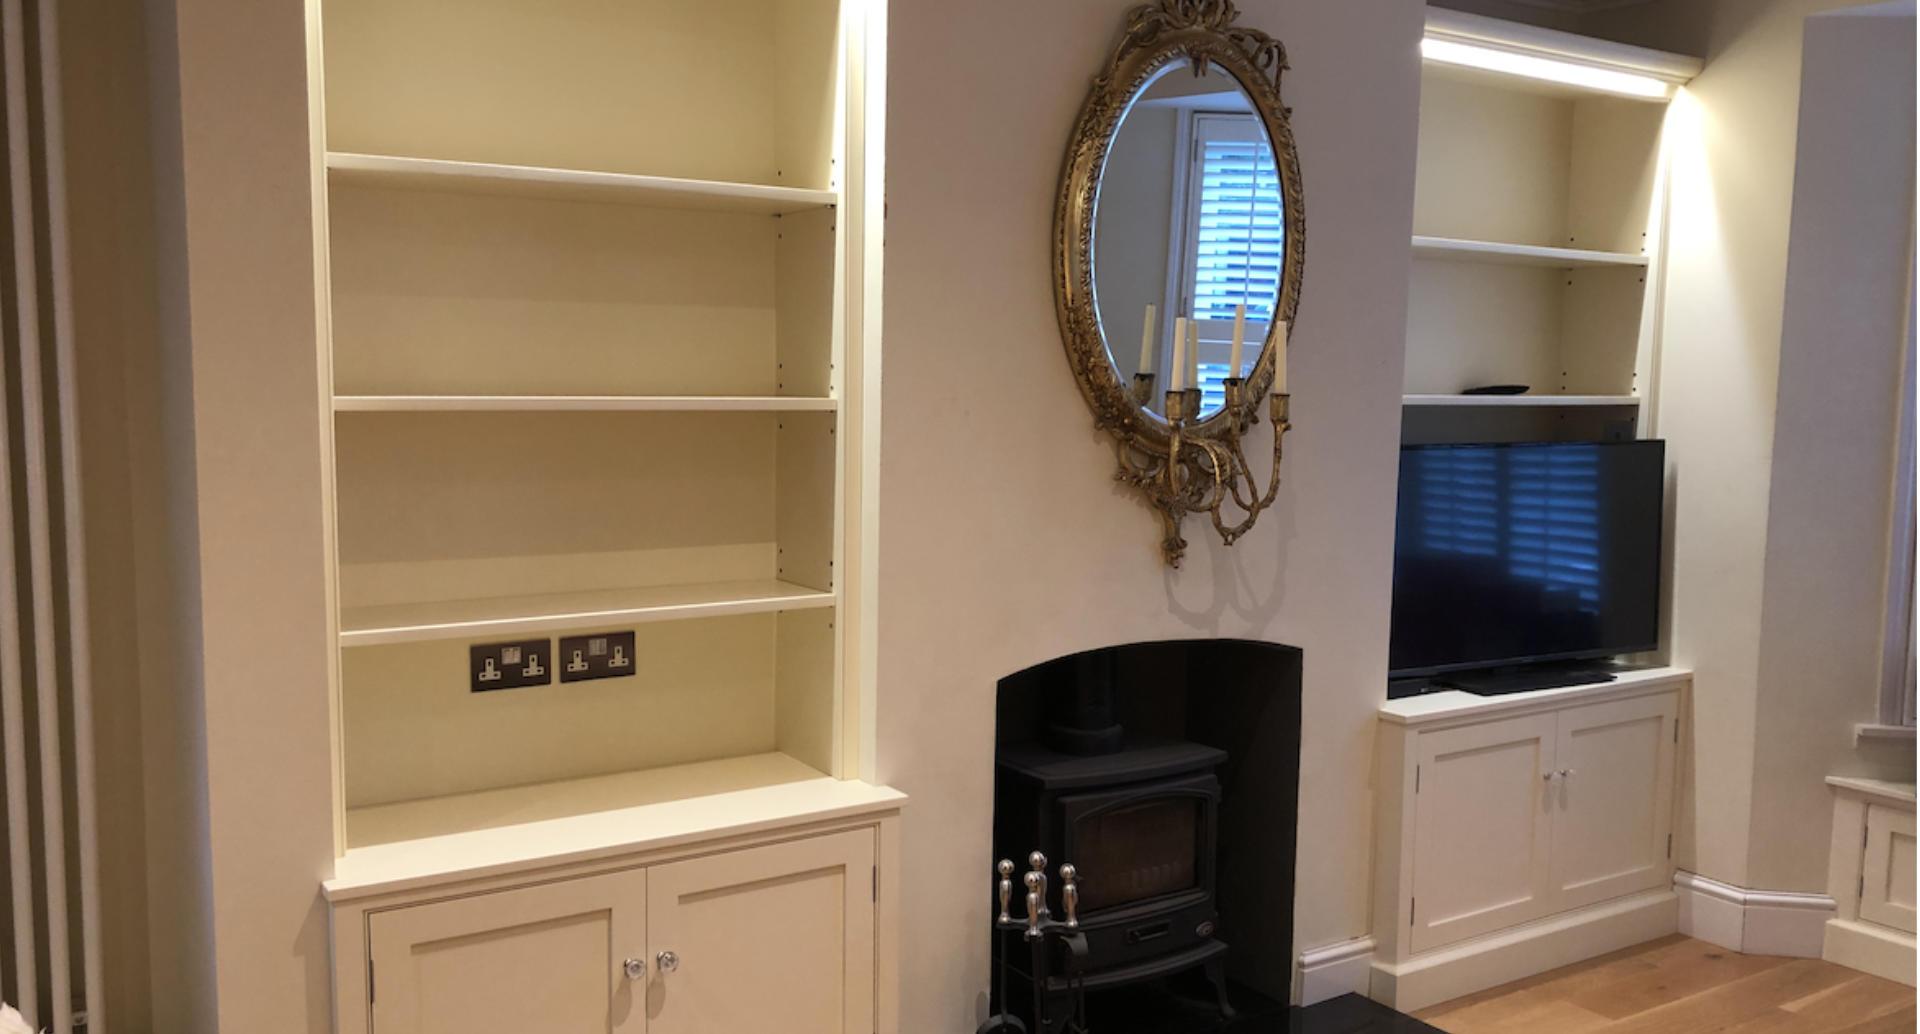 Two custom, bespoke bookcases with custom lighting